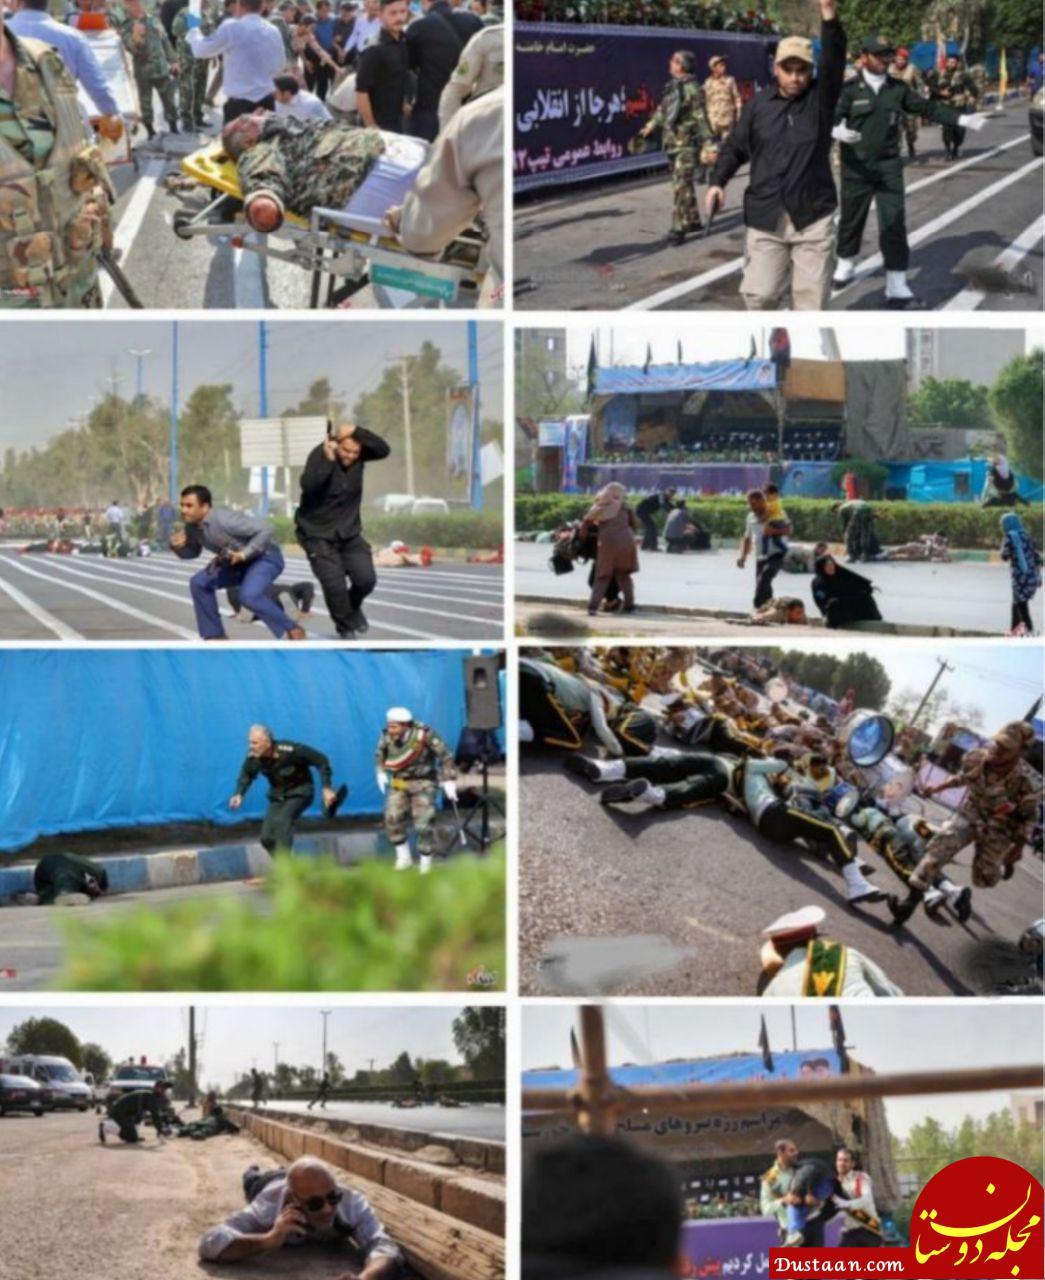 www.dustaan.com ریشه گروهک تروریستیالاحوازیه در کدام کشورها است؟